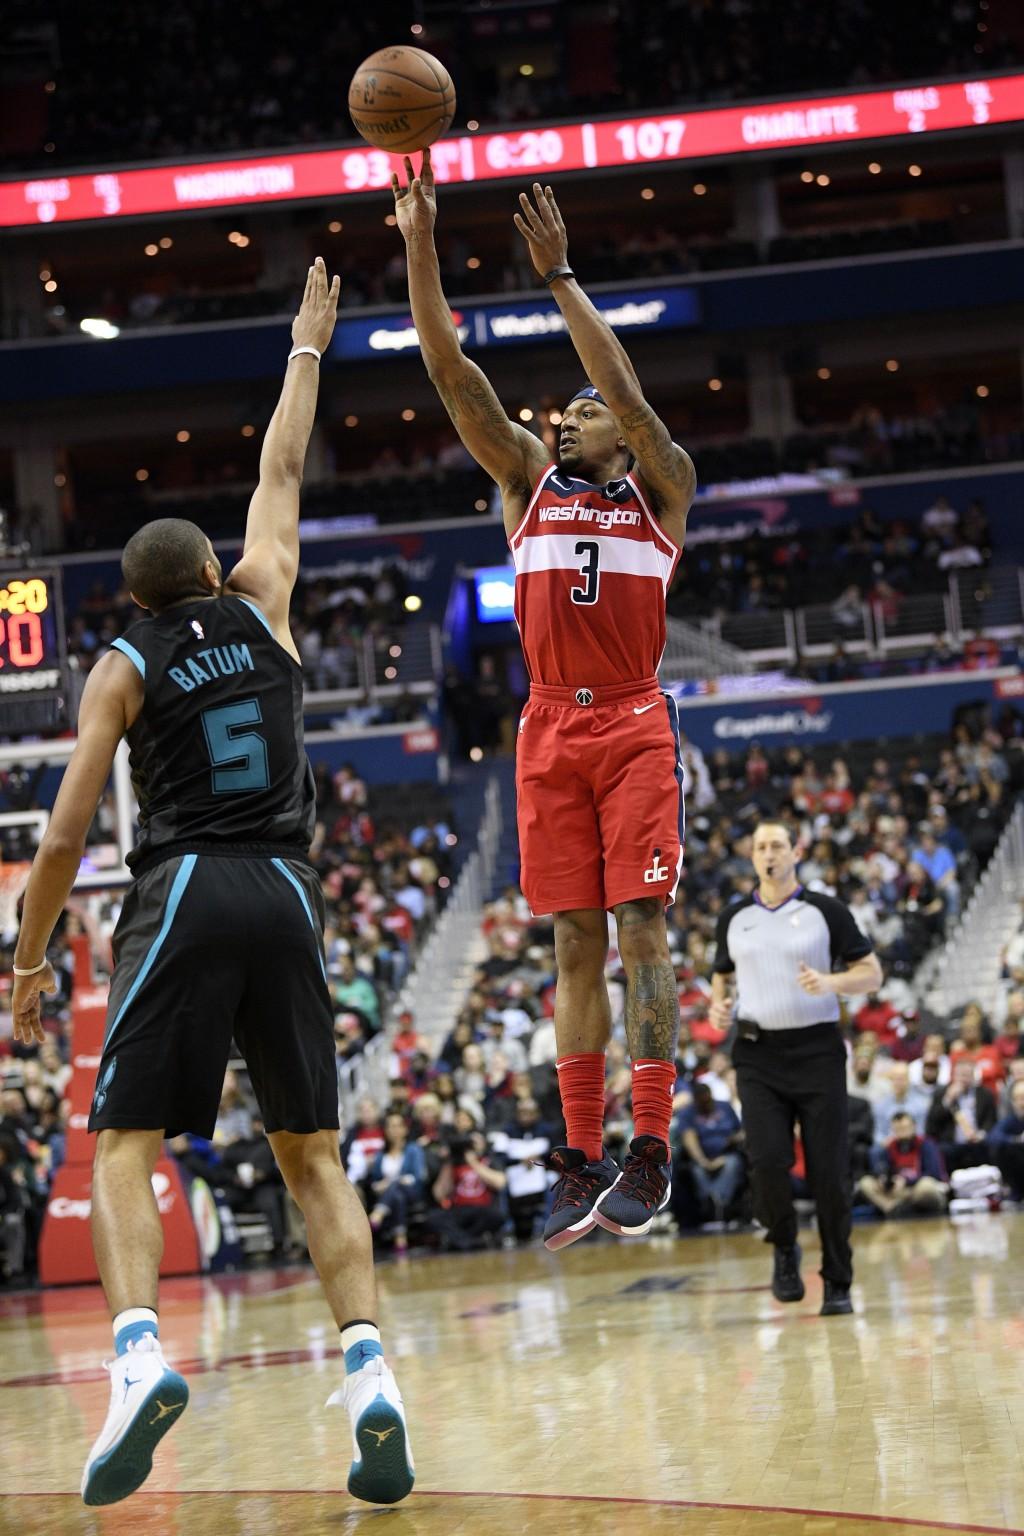 Washington Wizards guard Bradley Beal (3) shoots over Charlotte Hornets forward Nicolas Batum (5) during the second half of an NBA basketball game, Fr